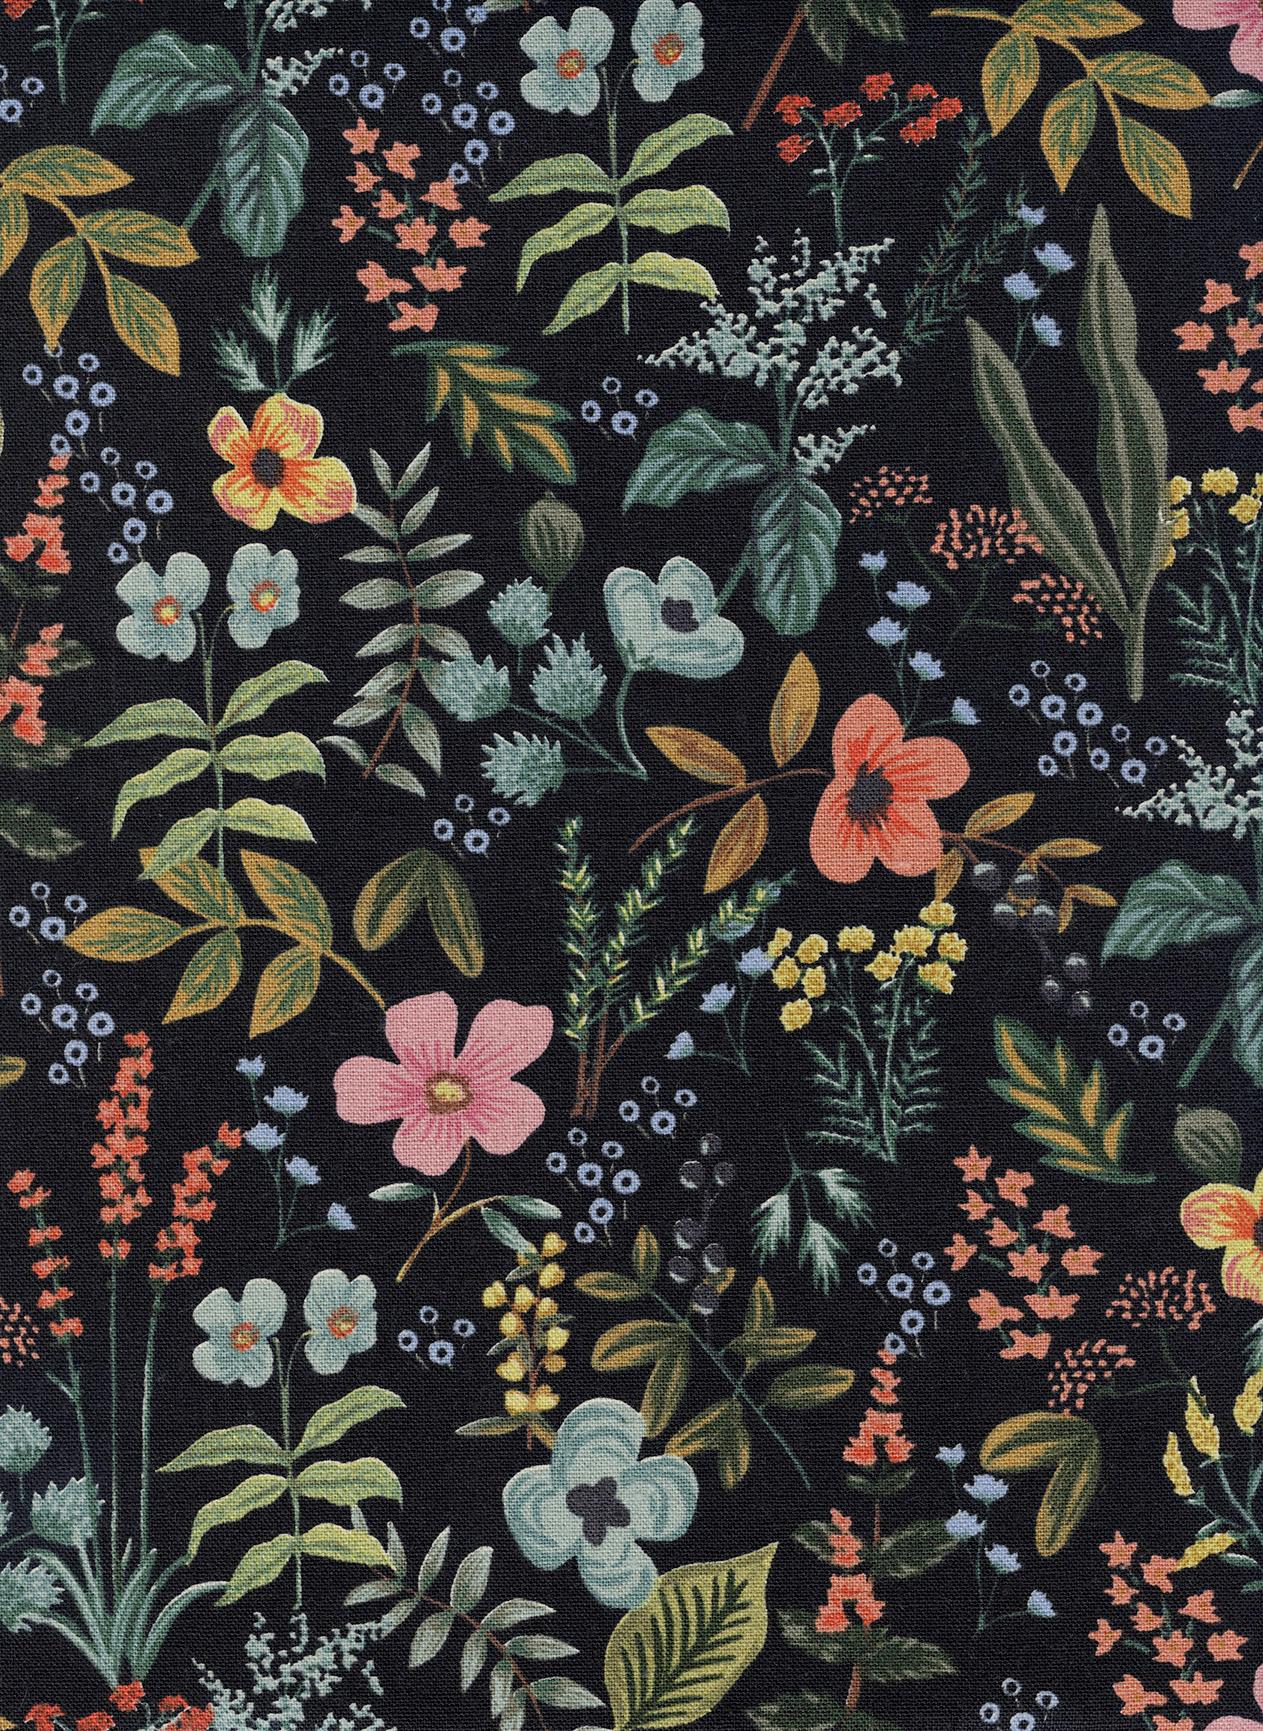 Canvas- Cotton Linen- Rifle Paper Co- Amalfi- Herb Garden- Midnight STH#11229719